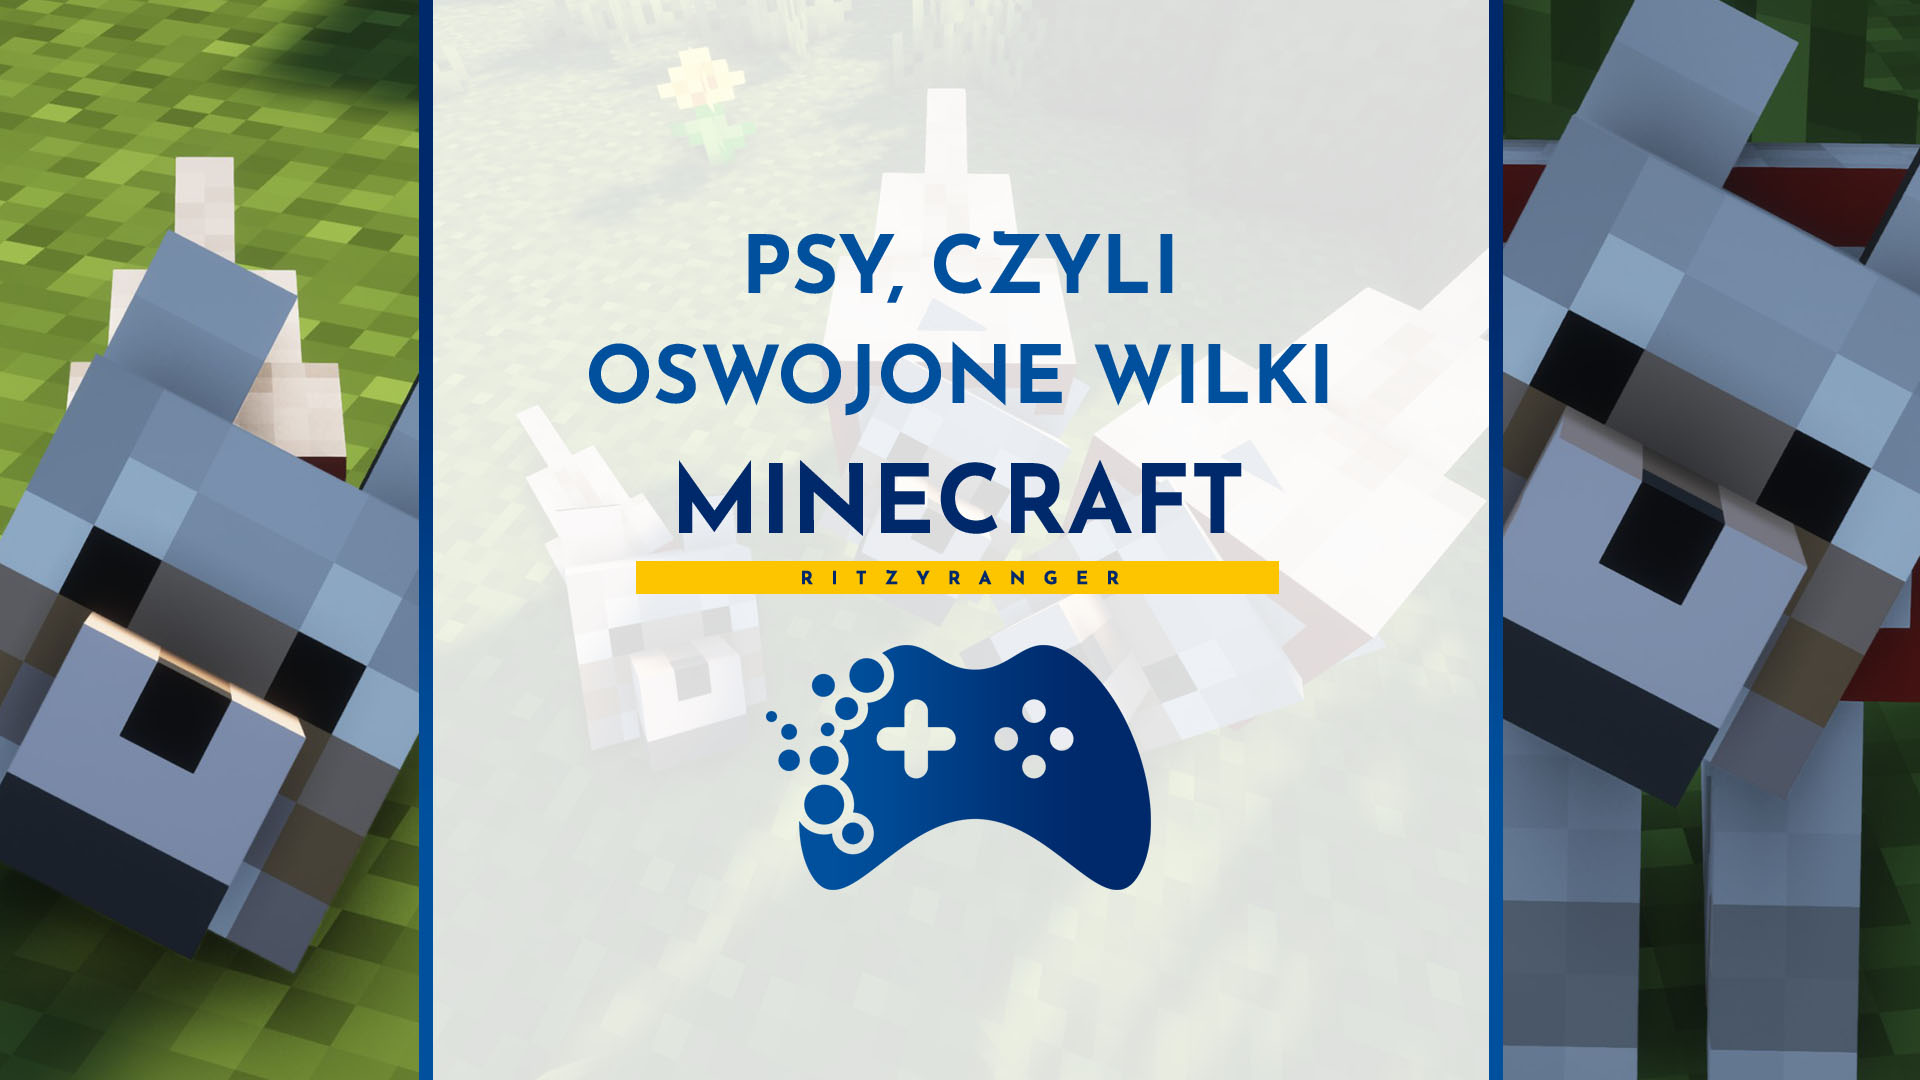 Psy Minecraft